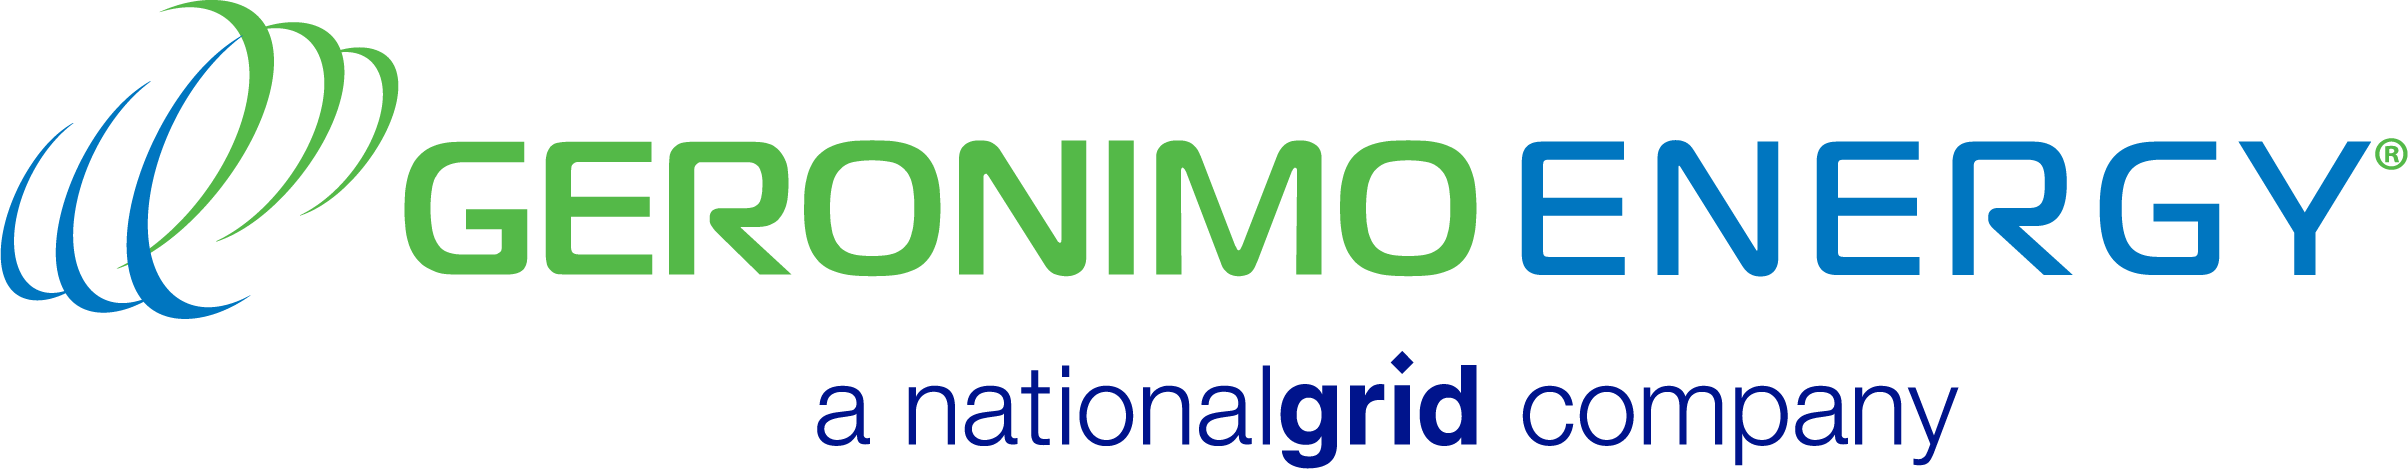 Geronimo Energy, a National Grid company logo